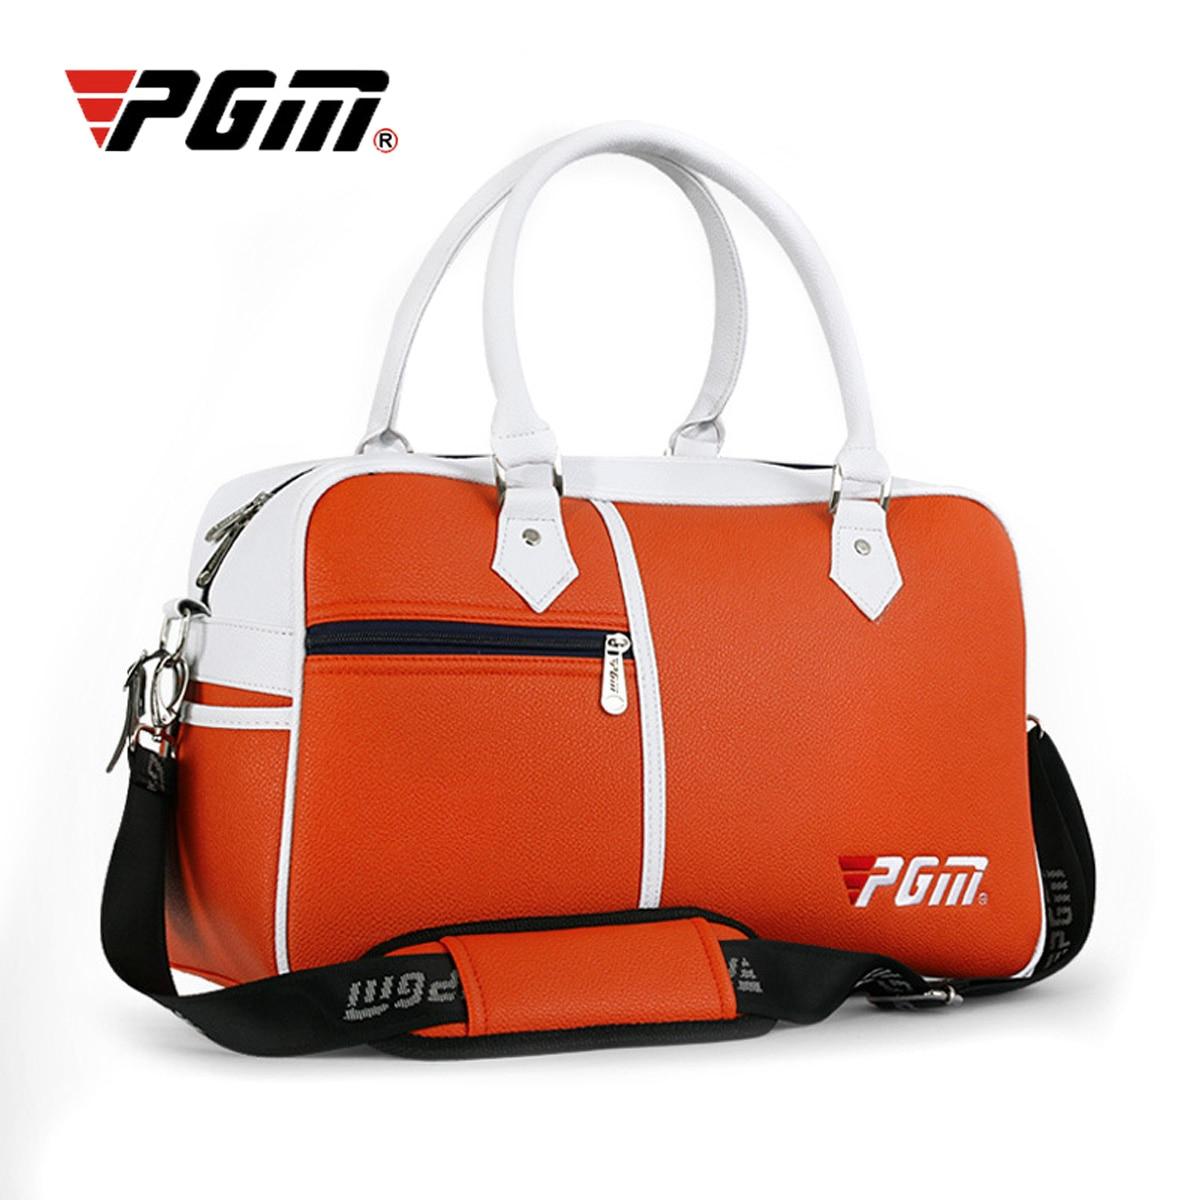 PGM Golf Bag Men's Golf Clothes Bag Womens Shoe Package Anti-dirt Box-shaped Bag Large Capacity Double-deck Clothes Bag 3 Colors